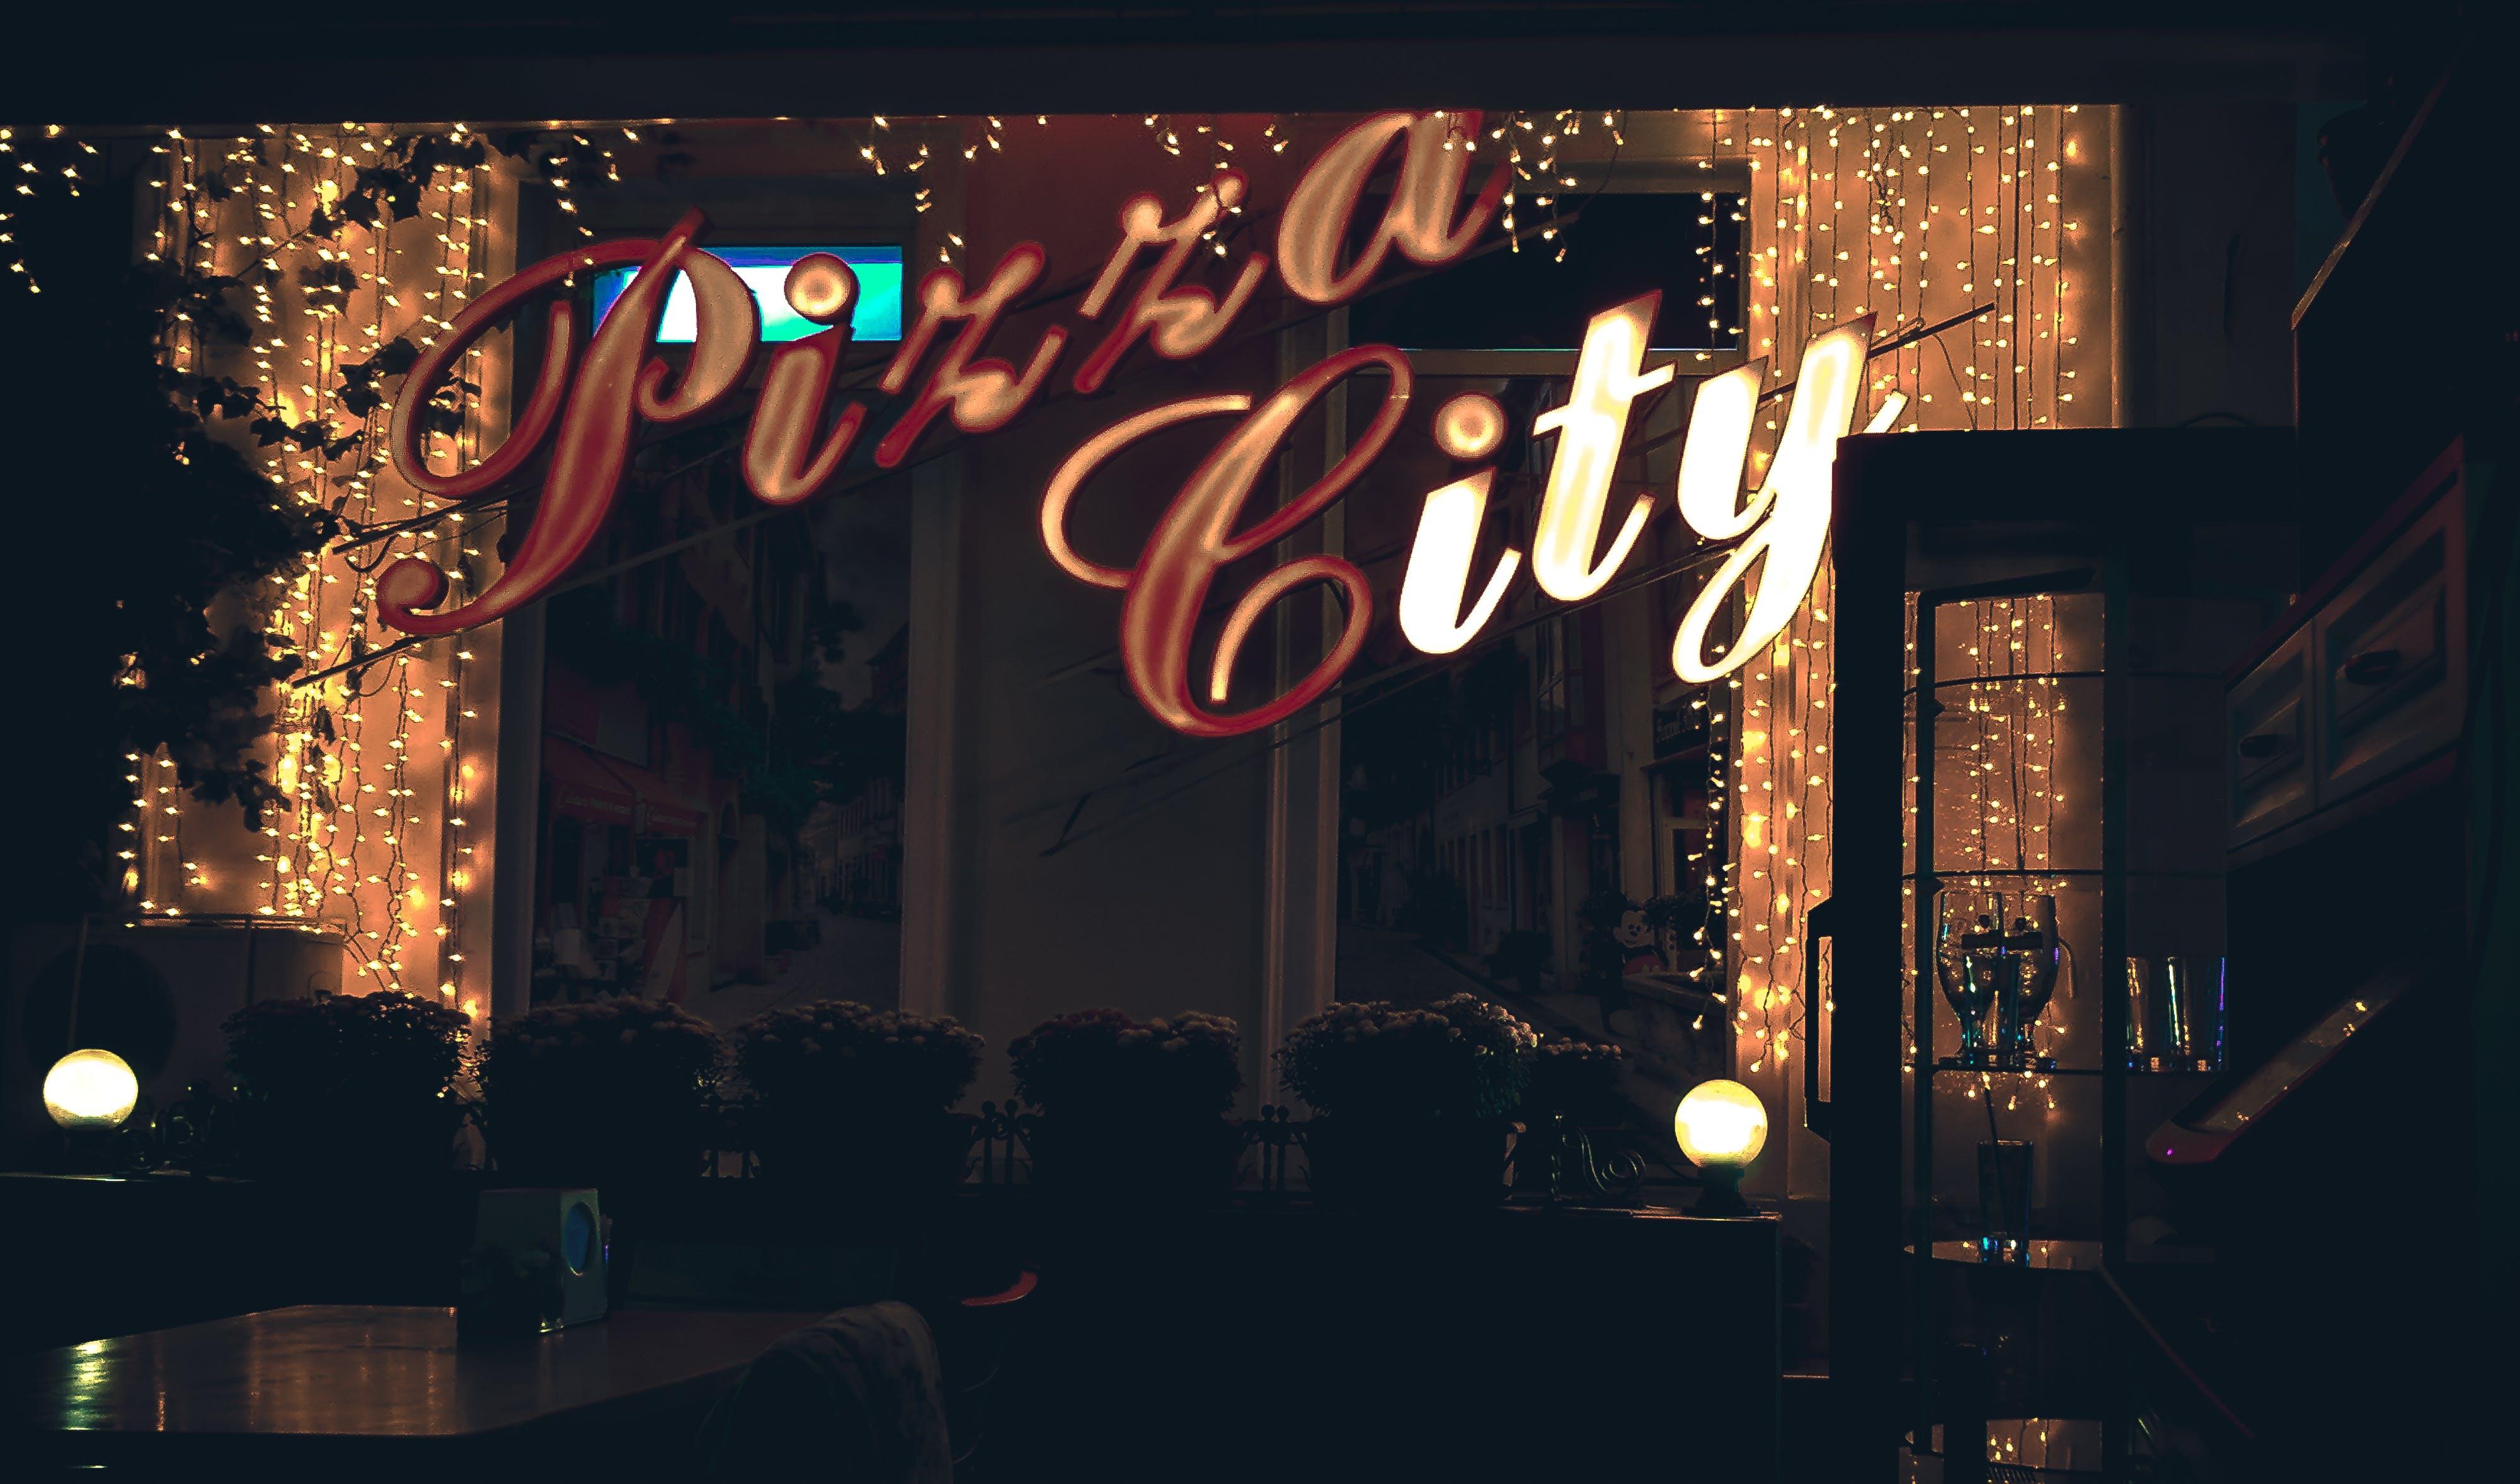 Pizza City Neon Signage